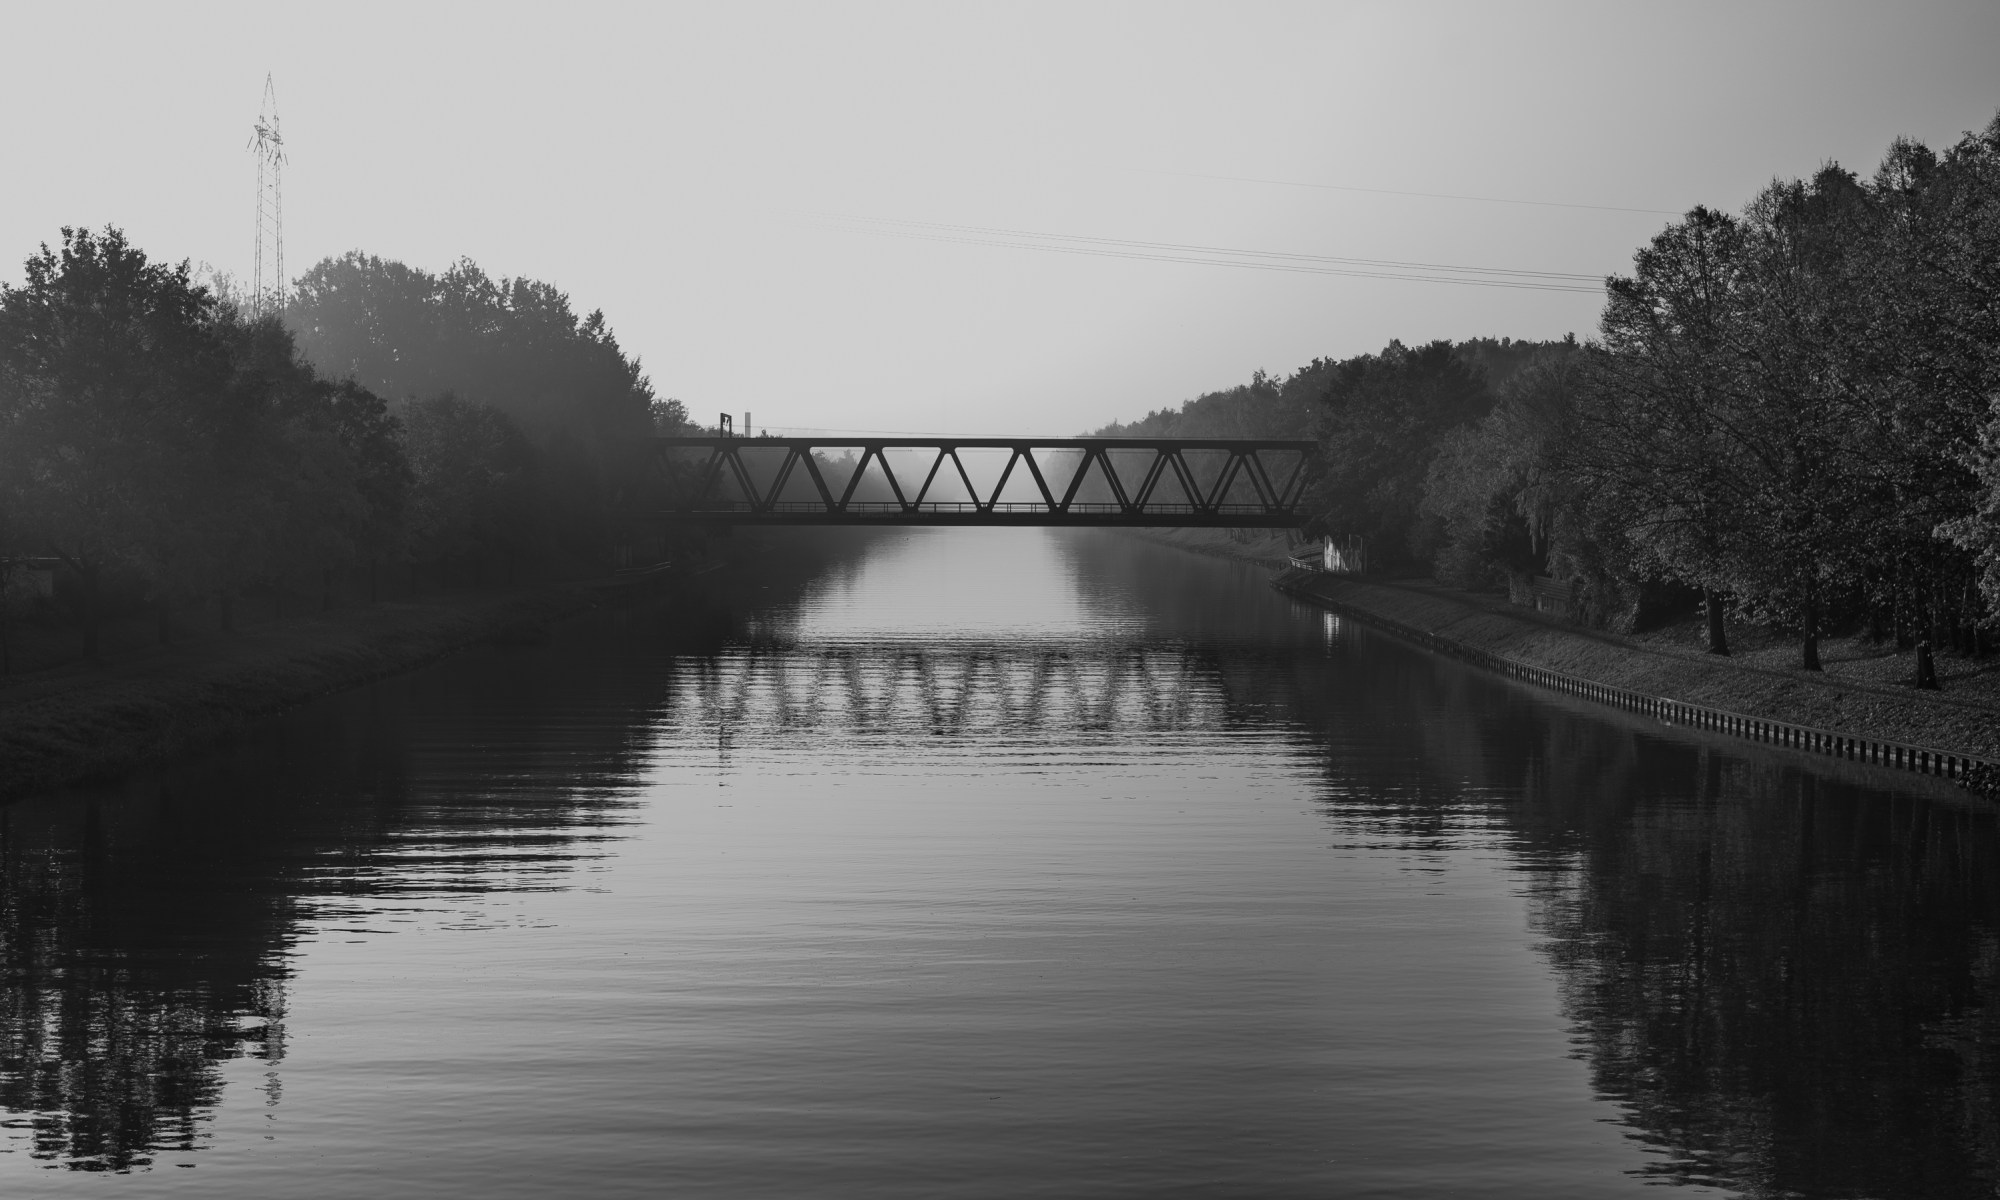 Kanalbrücke © Michael Nölke